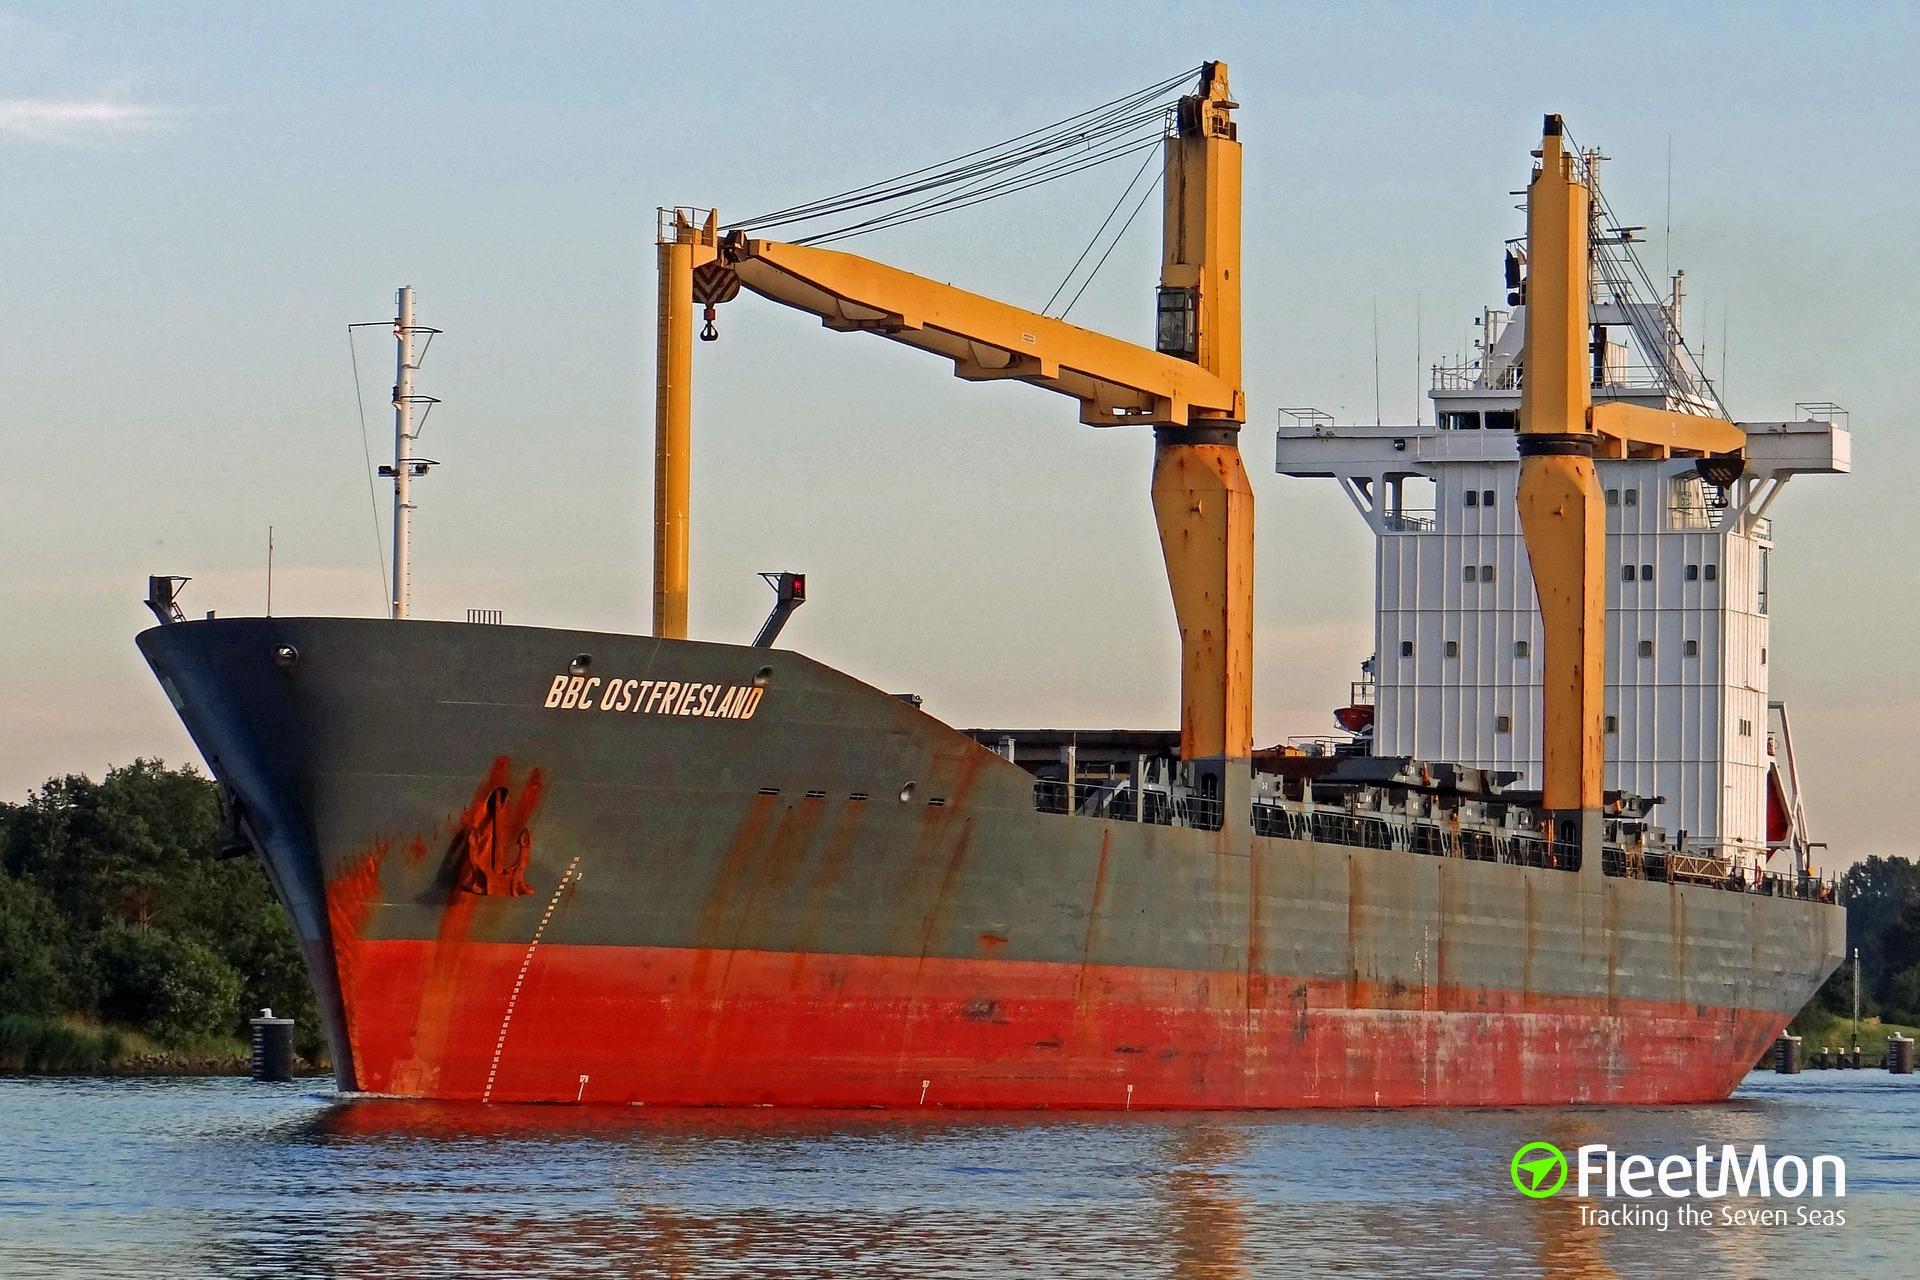 General cargo vessel BBC OSTFRIESLAND troubled